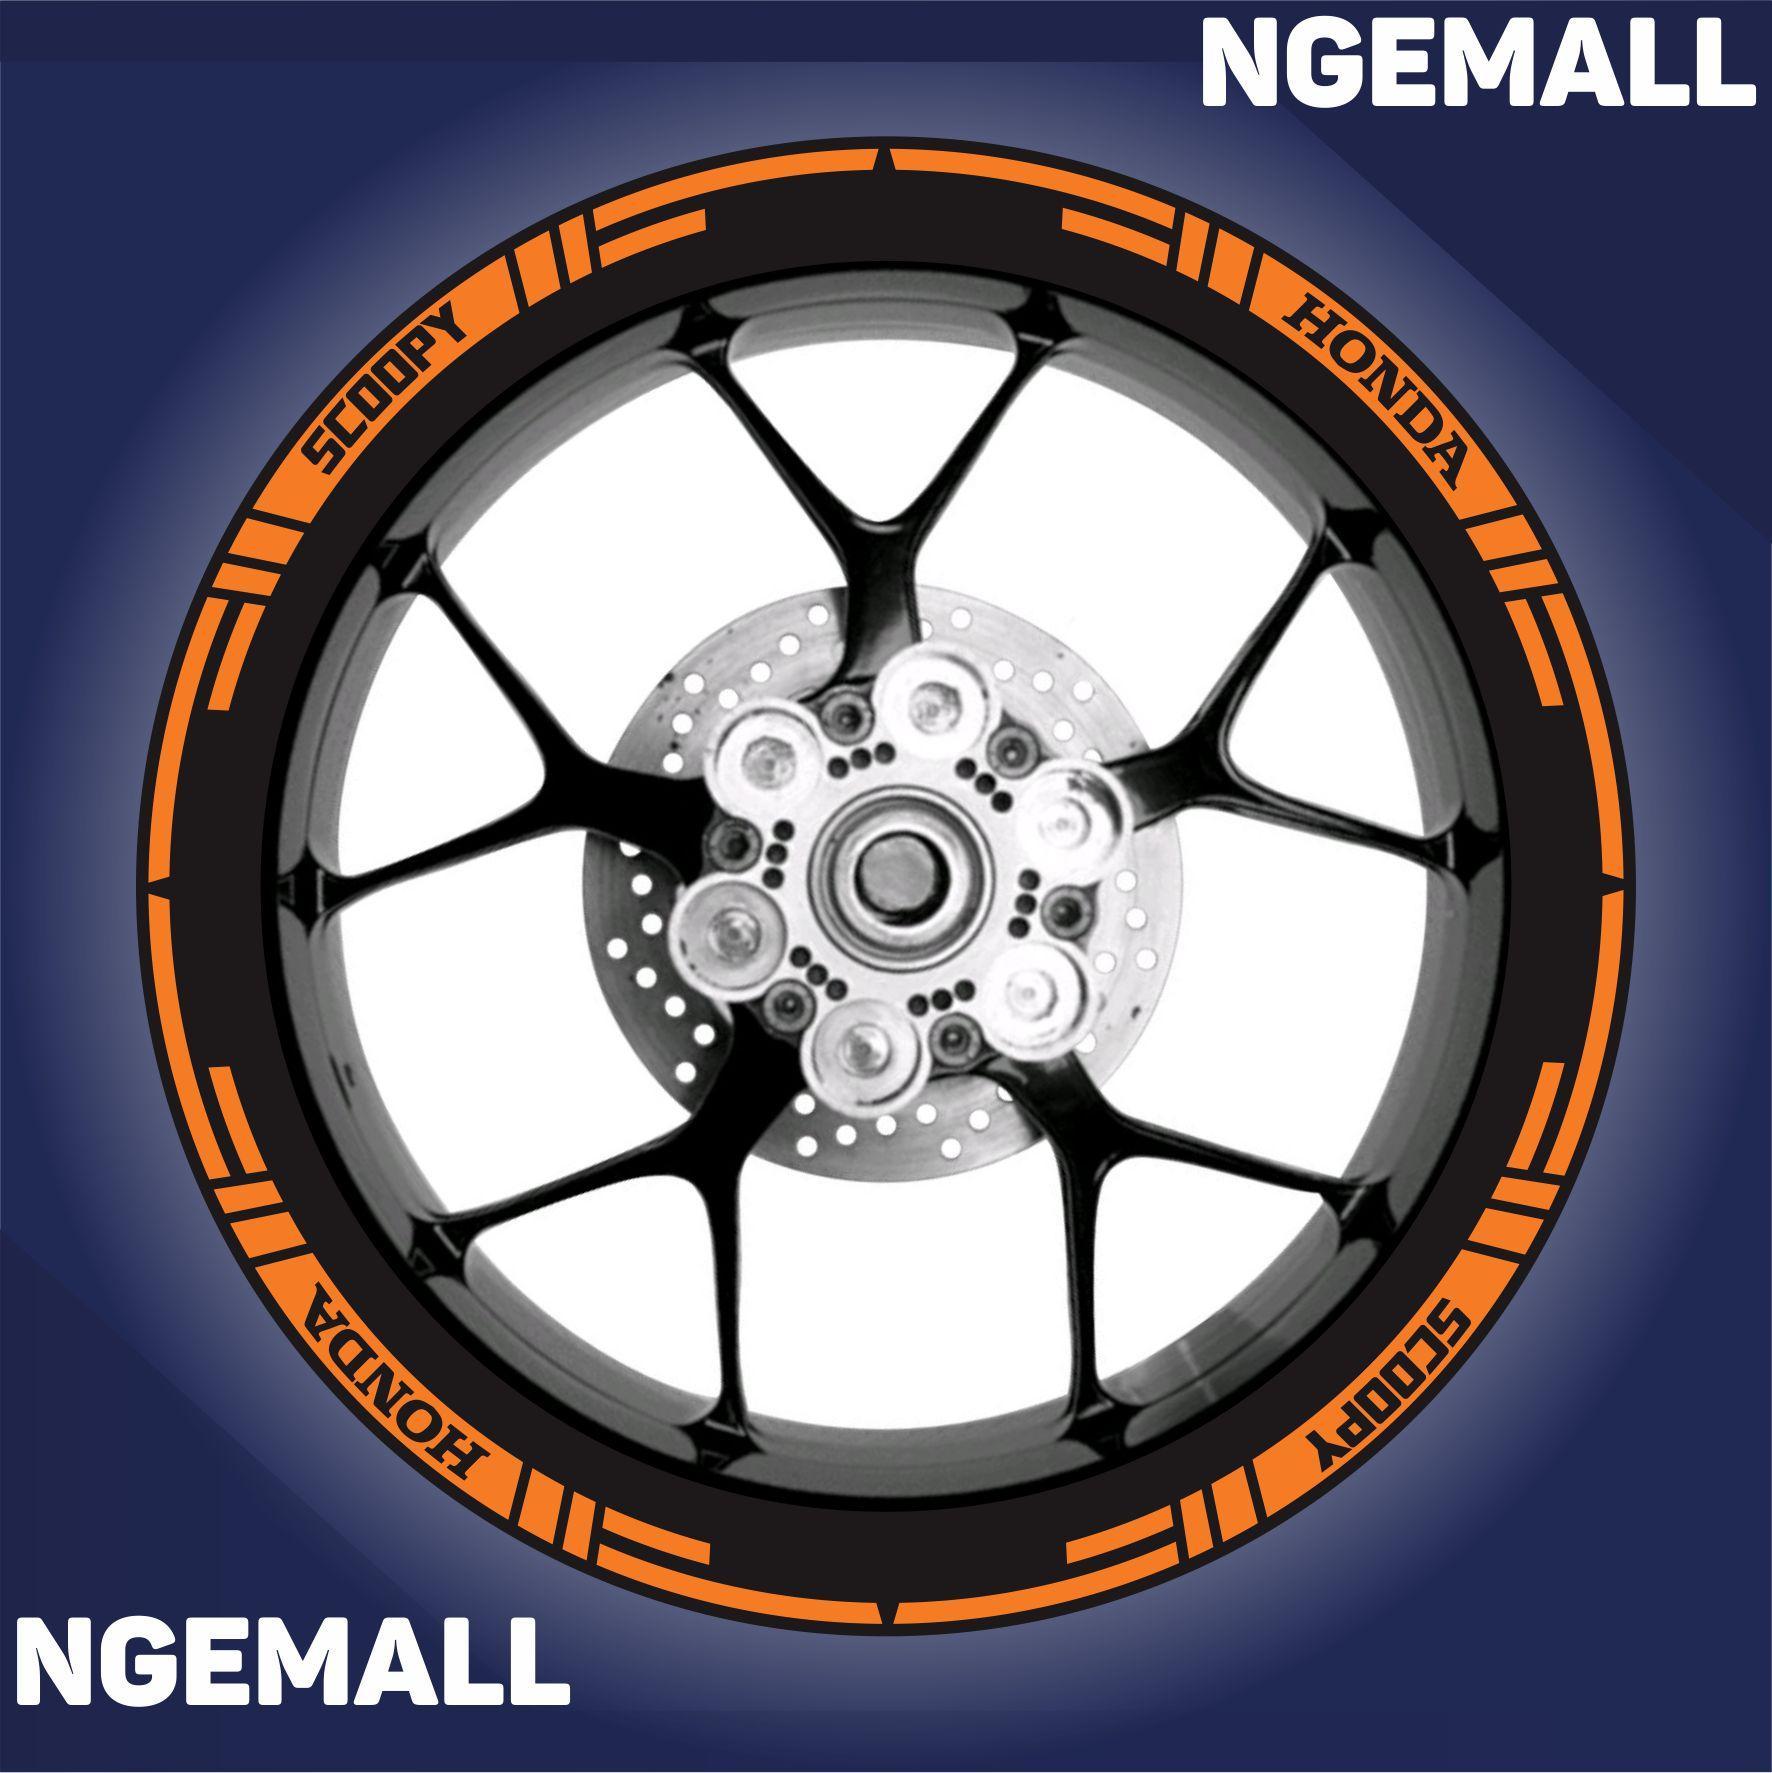 Ngemall - Aksesoris Motor Stiker Cutting 3 Velg Honda Scoopy - Orange - Ngemall